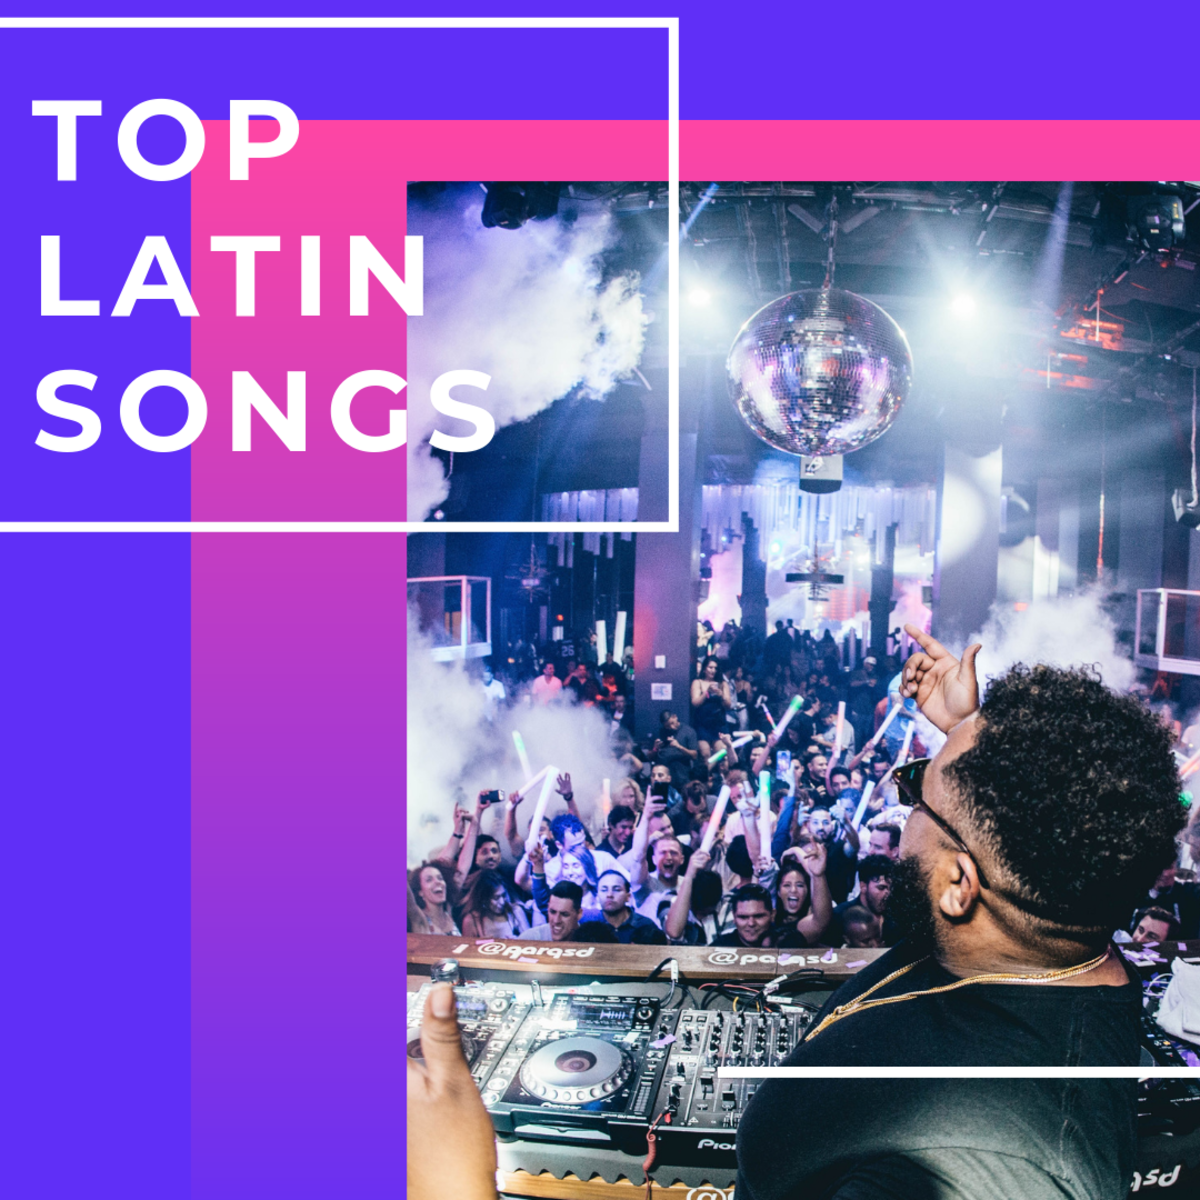 Top Latin Songs